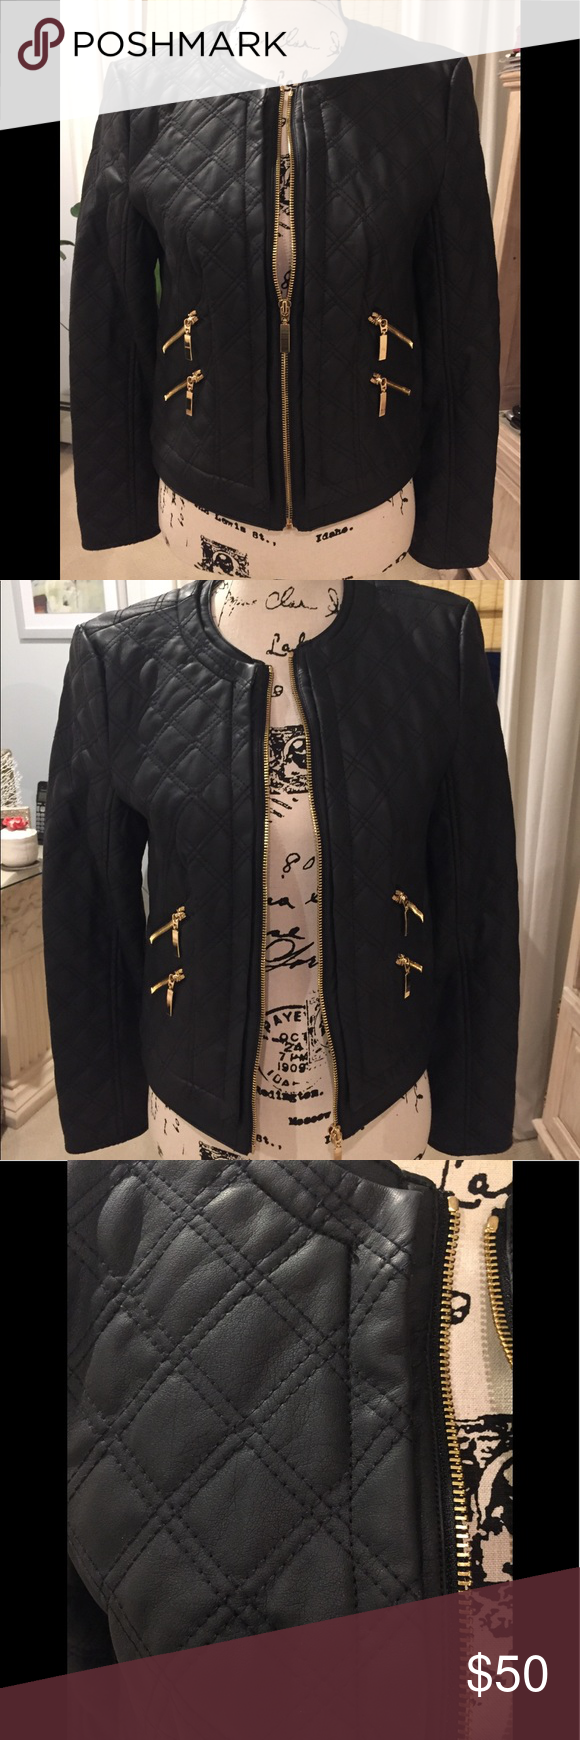 NWOT Vegan leather jacket Vegan leather jacket, Jackets